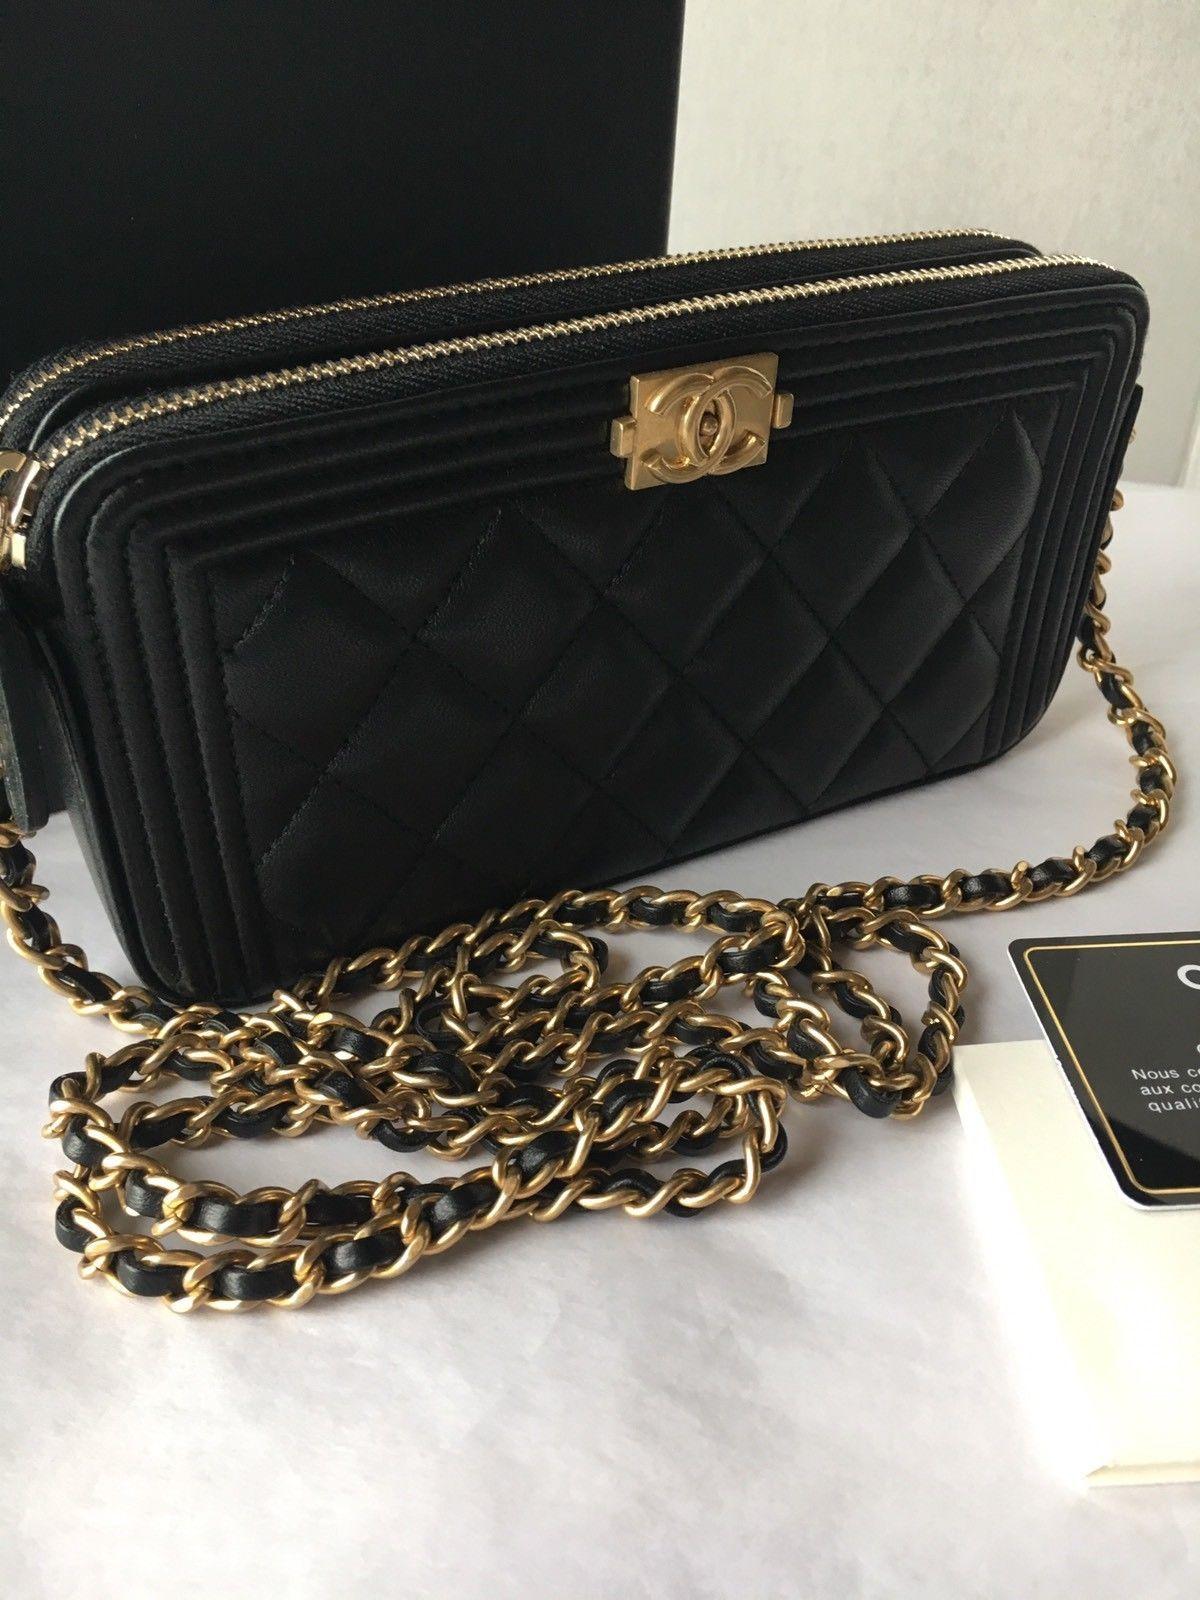 3bb91e82ce153f Auth BNIB Chanel Boy WOC Double Zip Black Lambskin Wallet On A Chain Bag  2017 $1950.0